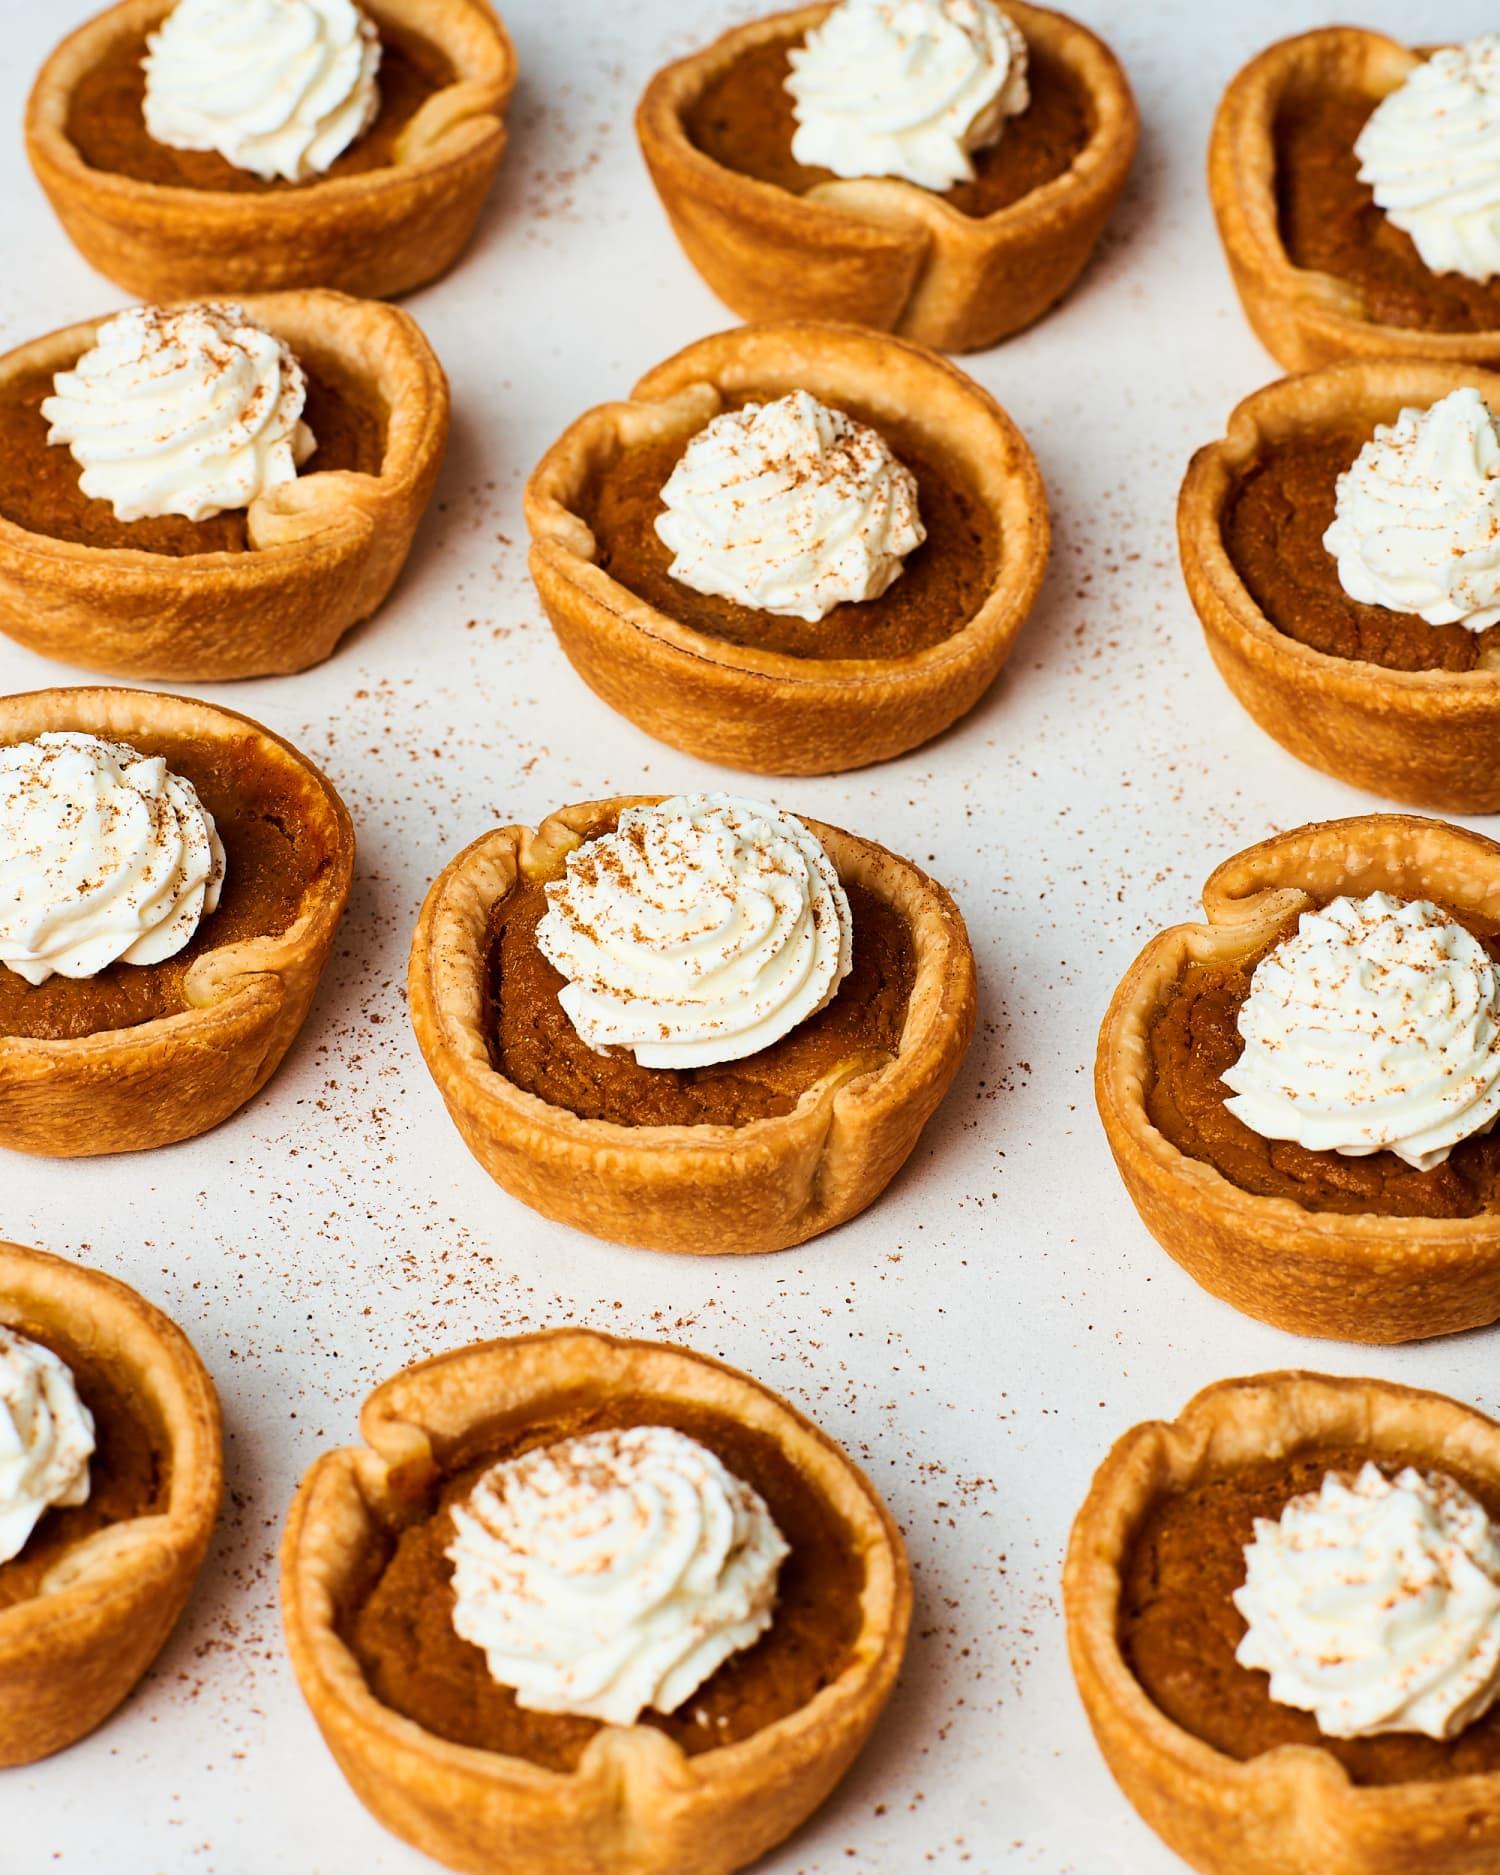 How To Make Easy 5-Ingredient Mini Pumpkin Pies